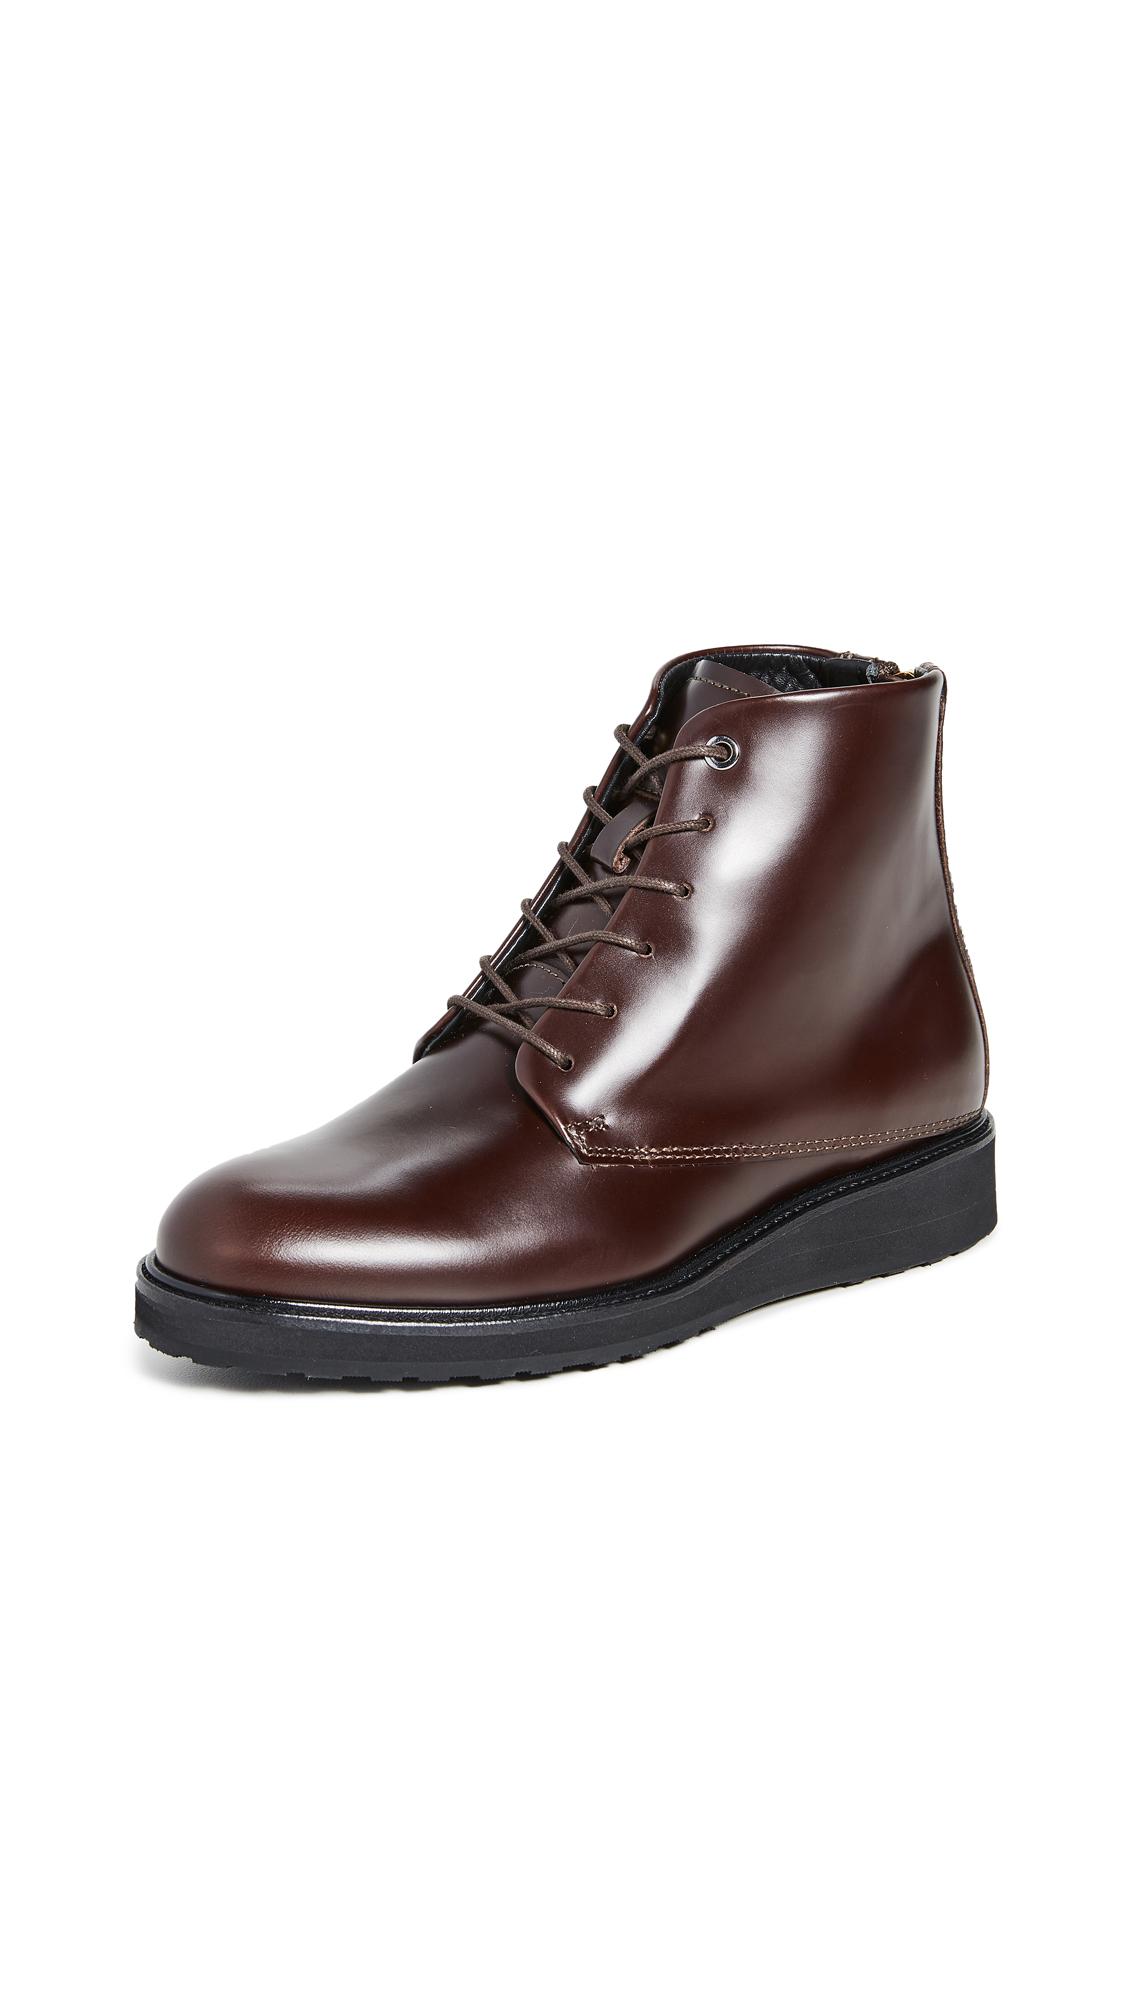 Buy WANT Les Essentiels online - photo of WANT Les Essentiels Menara High Wedge Derby Boots